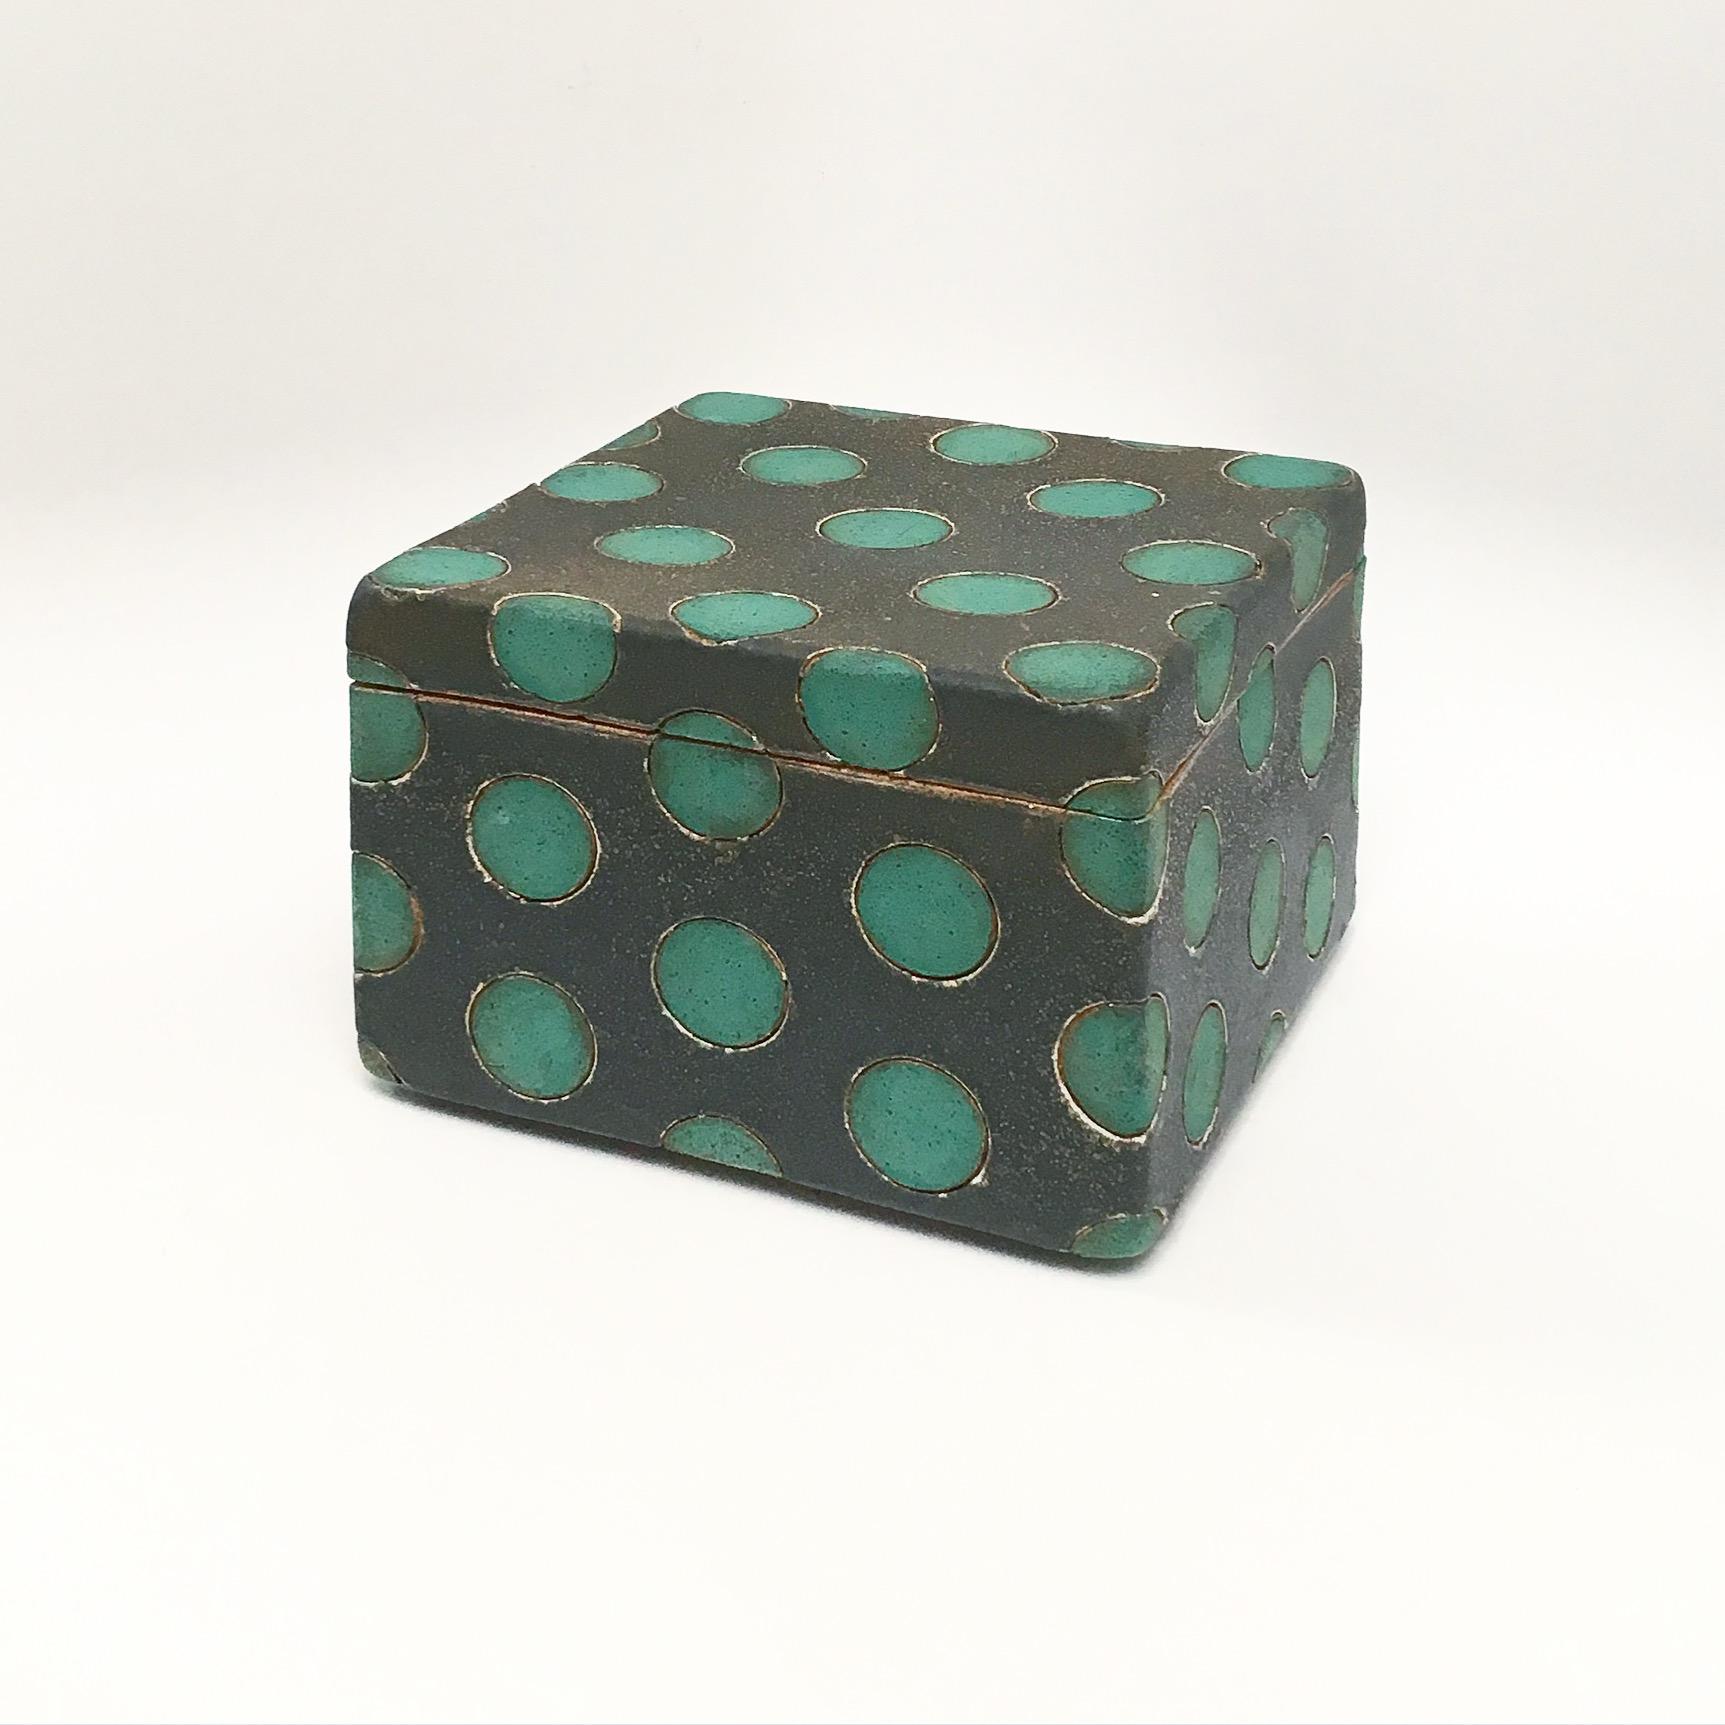 Green on Black Polka Dot Box